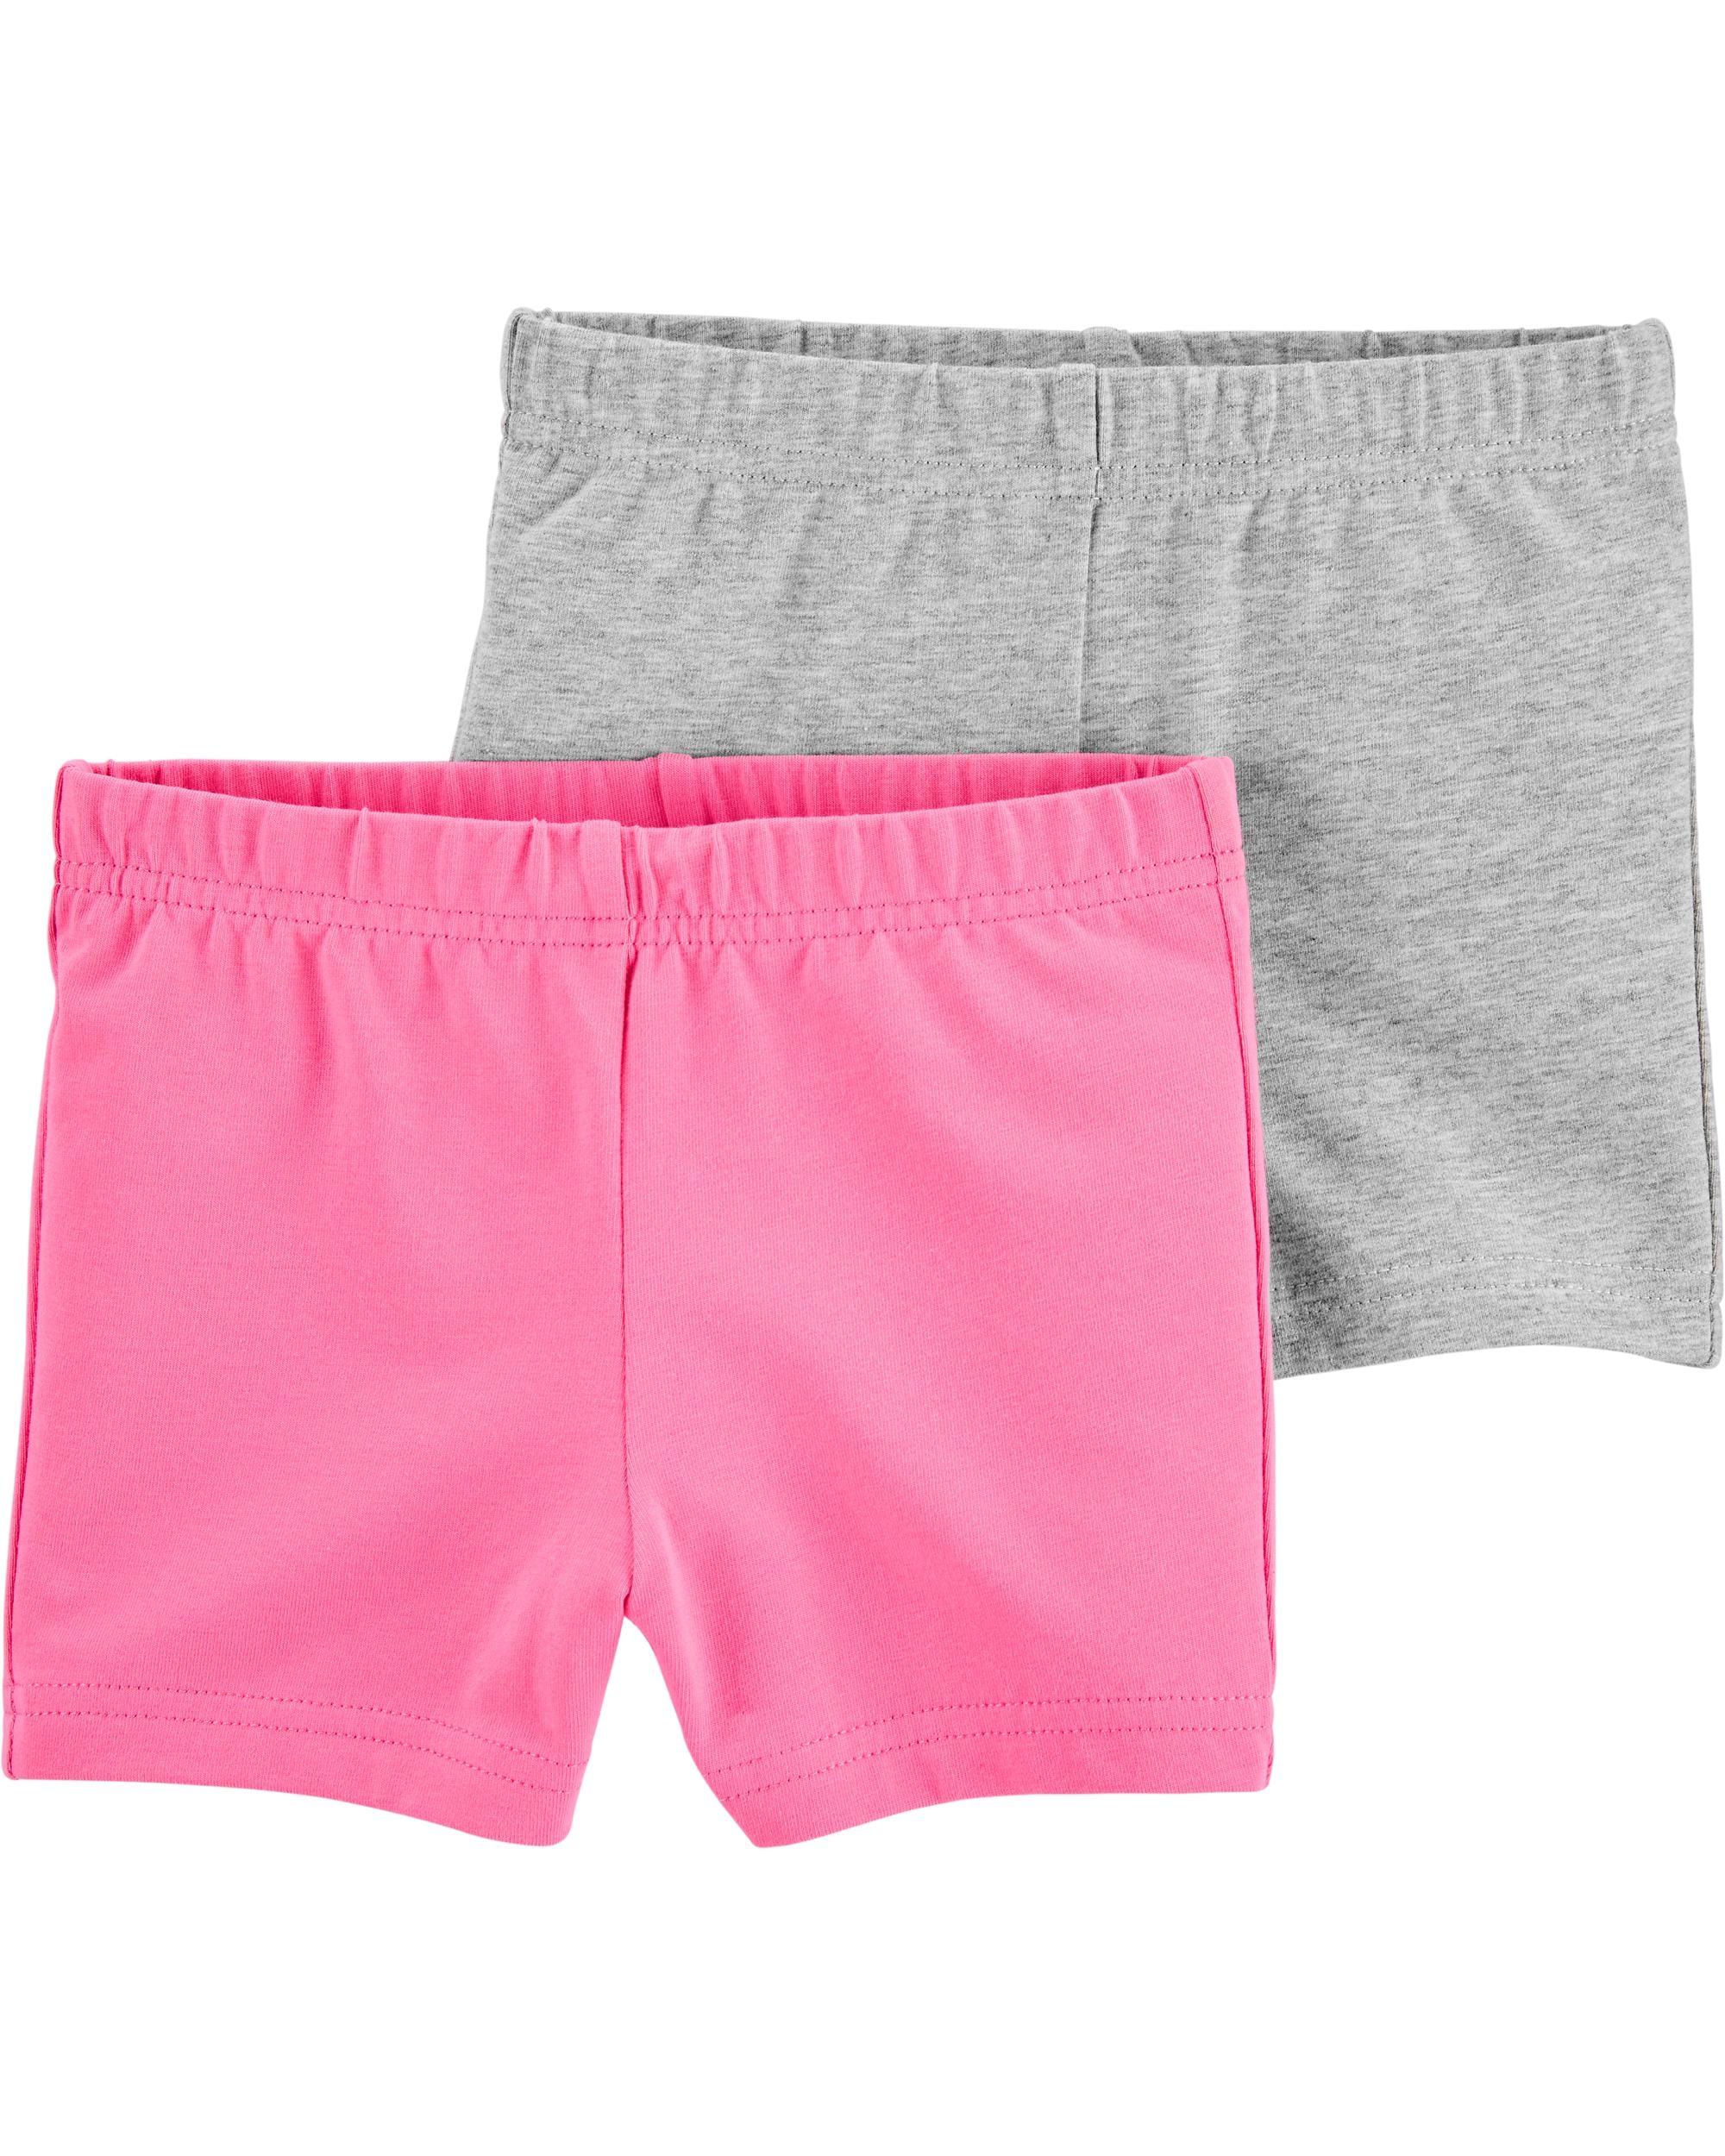 Carters Set 2 piese pantaloni scurti roz si gri imagine